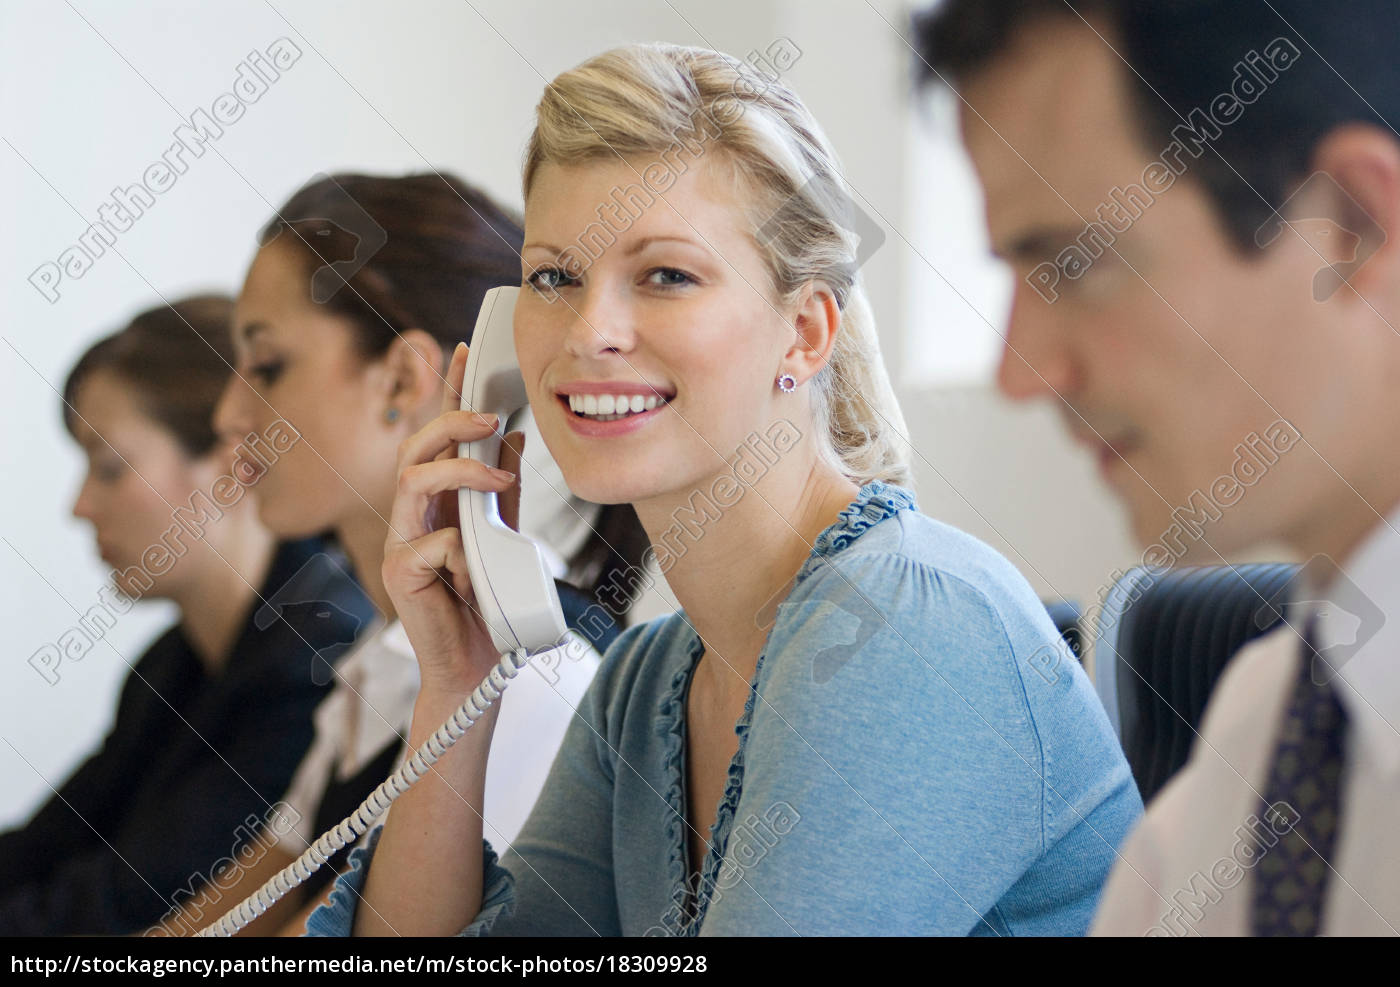 ein, business-frau, am, telefon, lächeln - 18309928